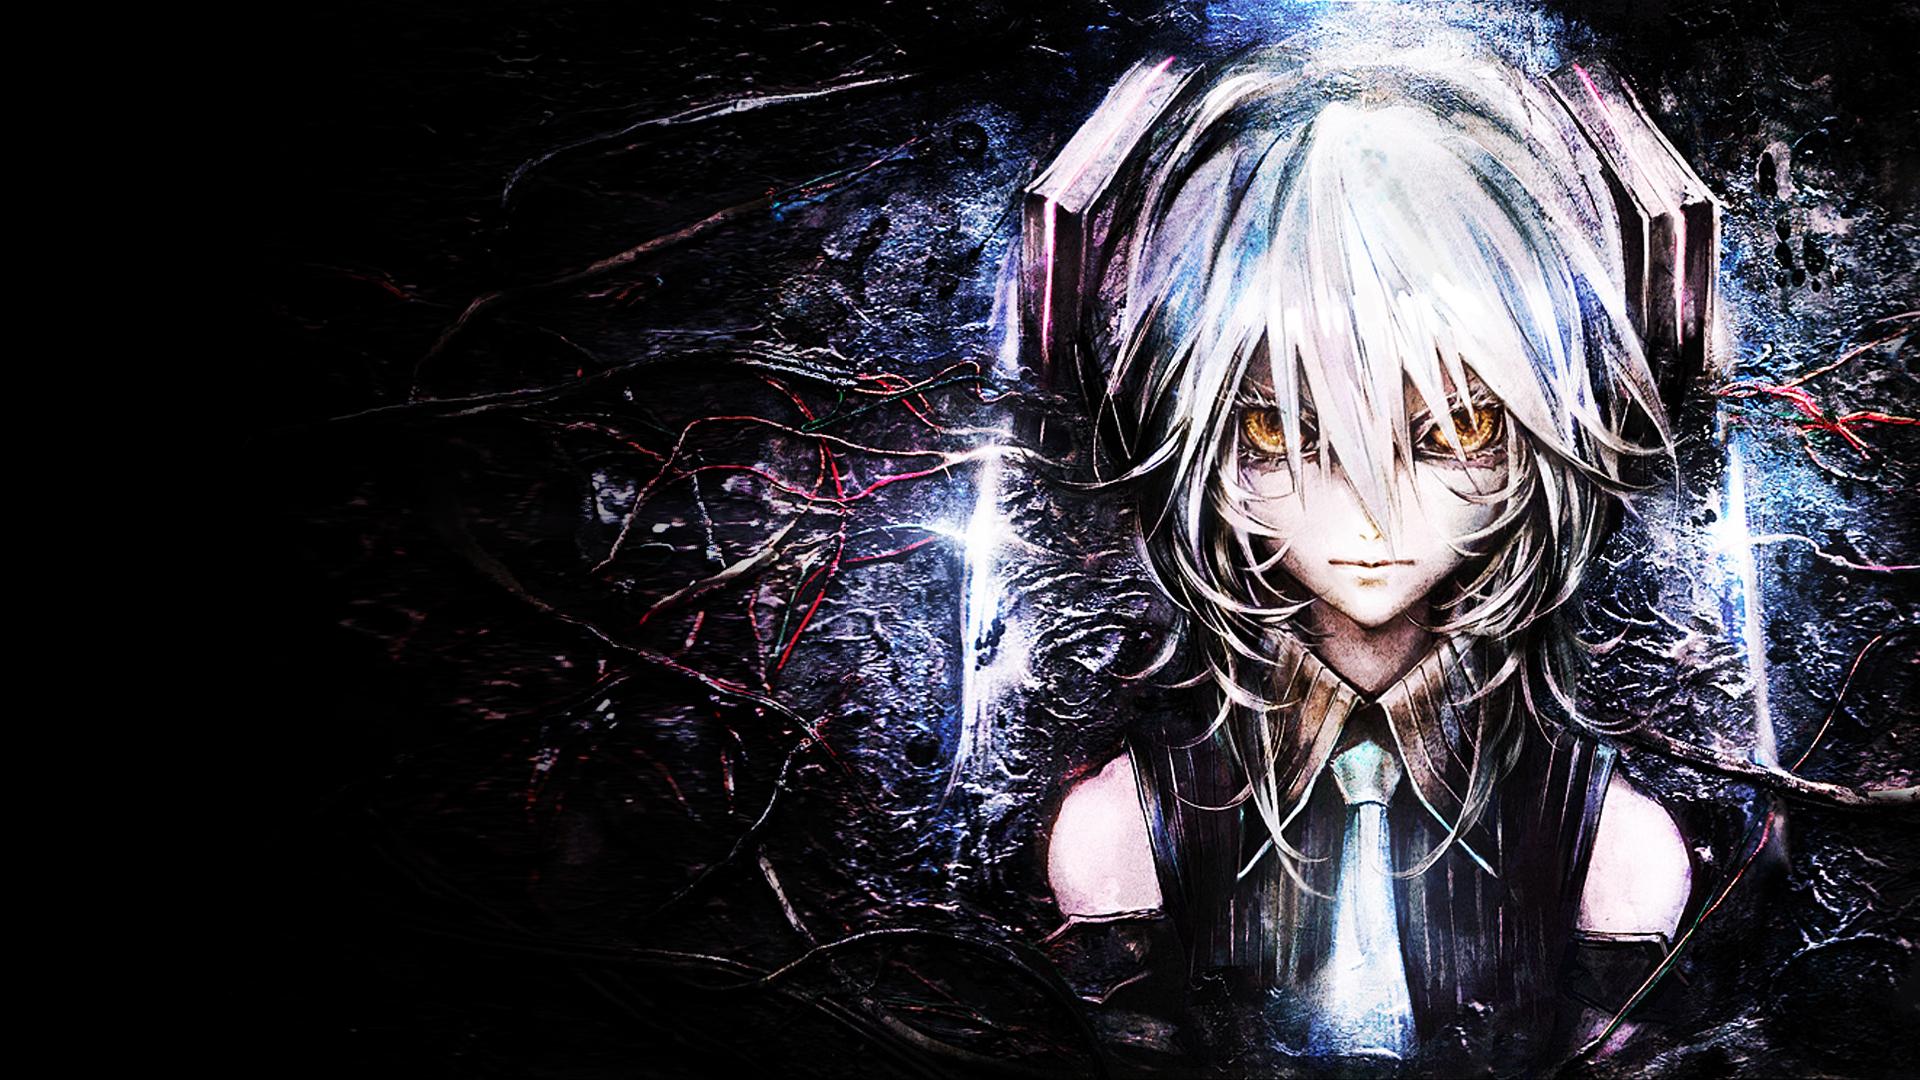 Download cool anime hd desktop image HD wallpaper 1920x1080